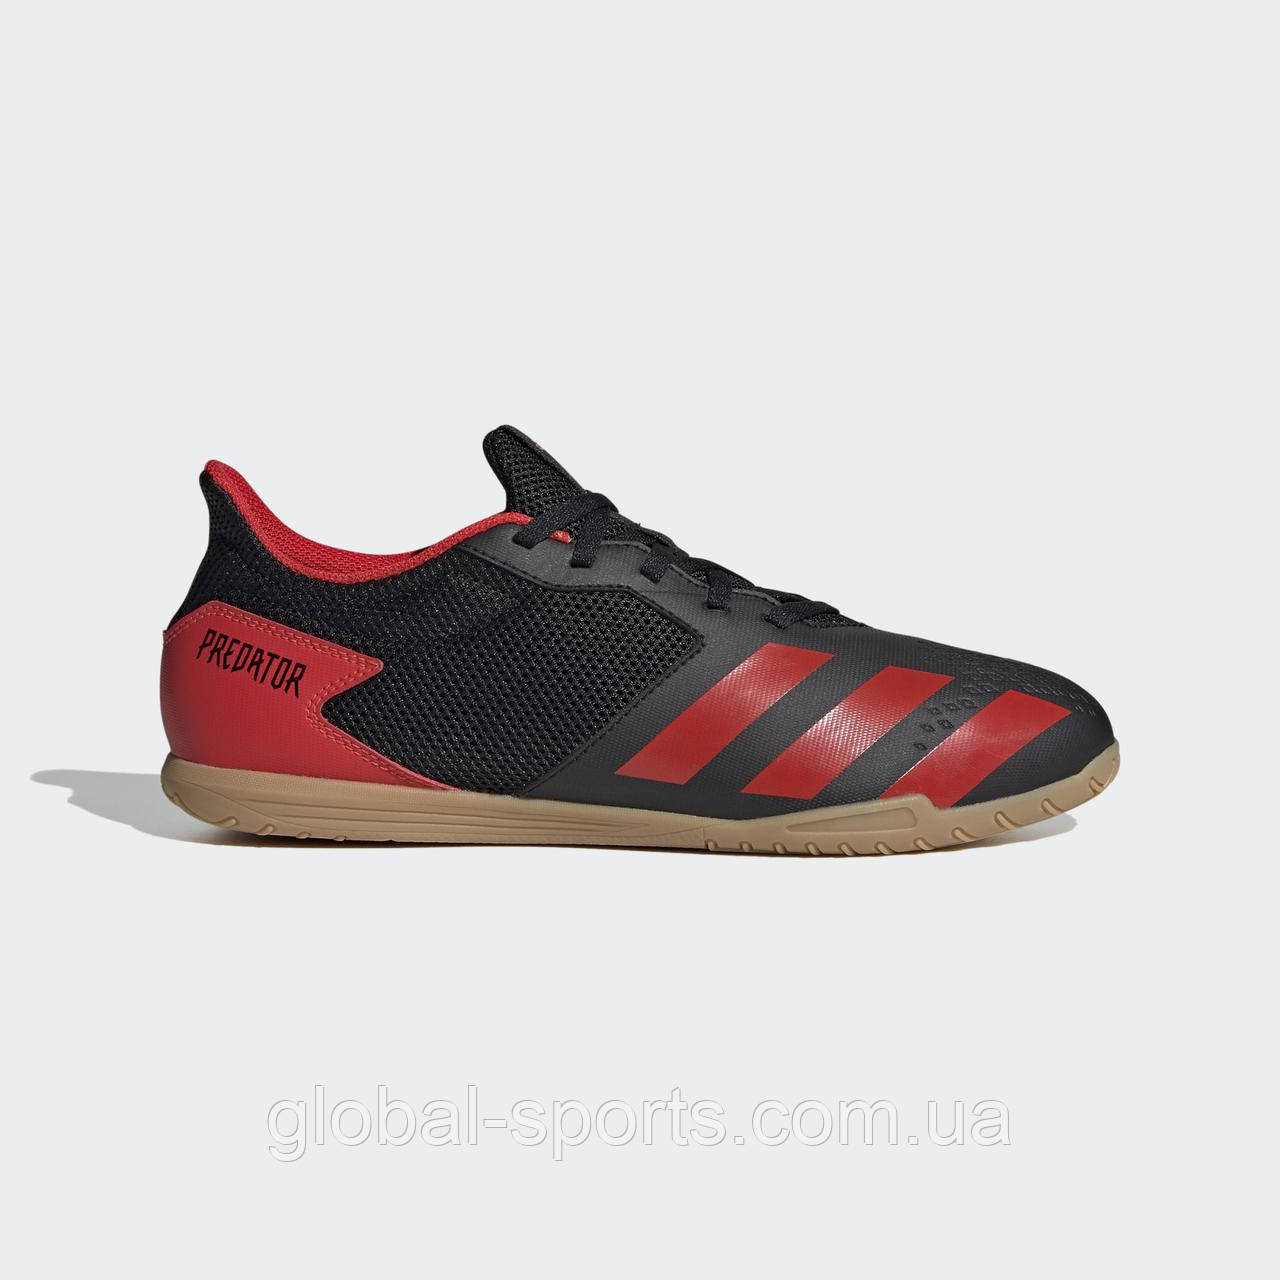 Футбольные бутсы (футзалки) Adidas Predator 20.4 IN Sala(Артикул:EE9580)